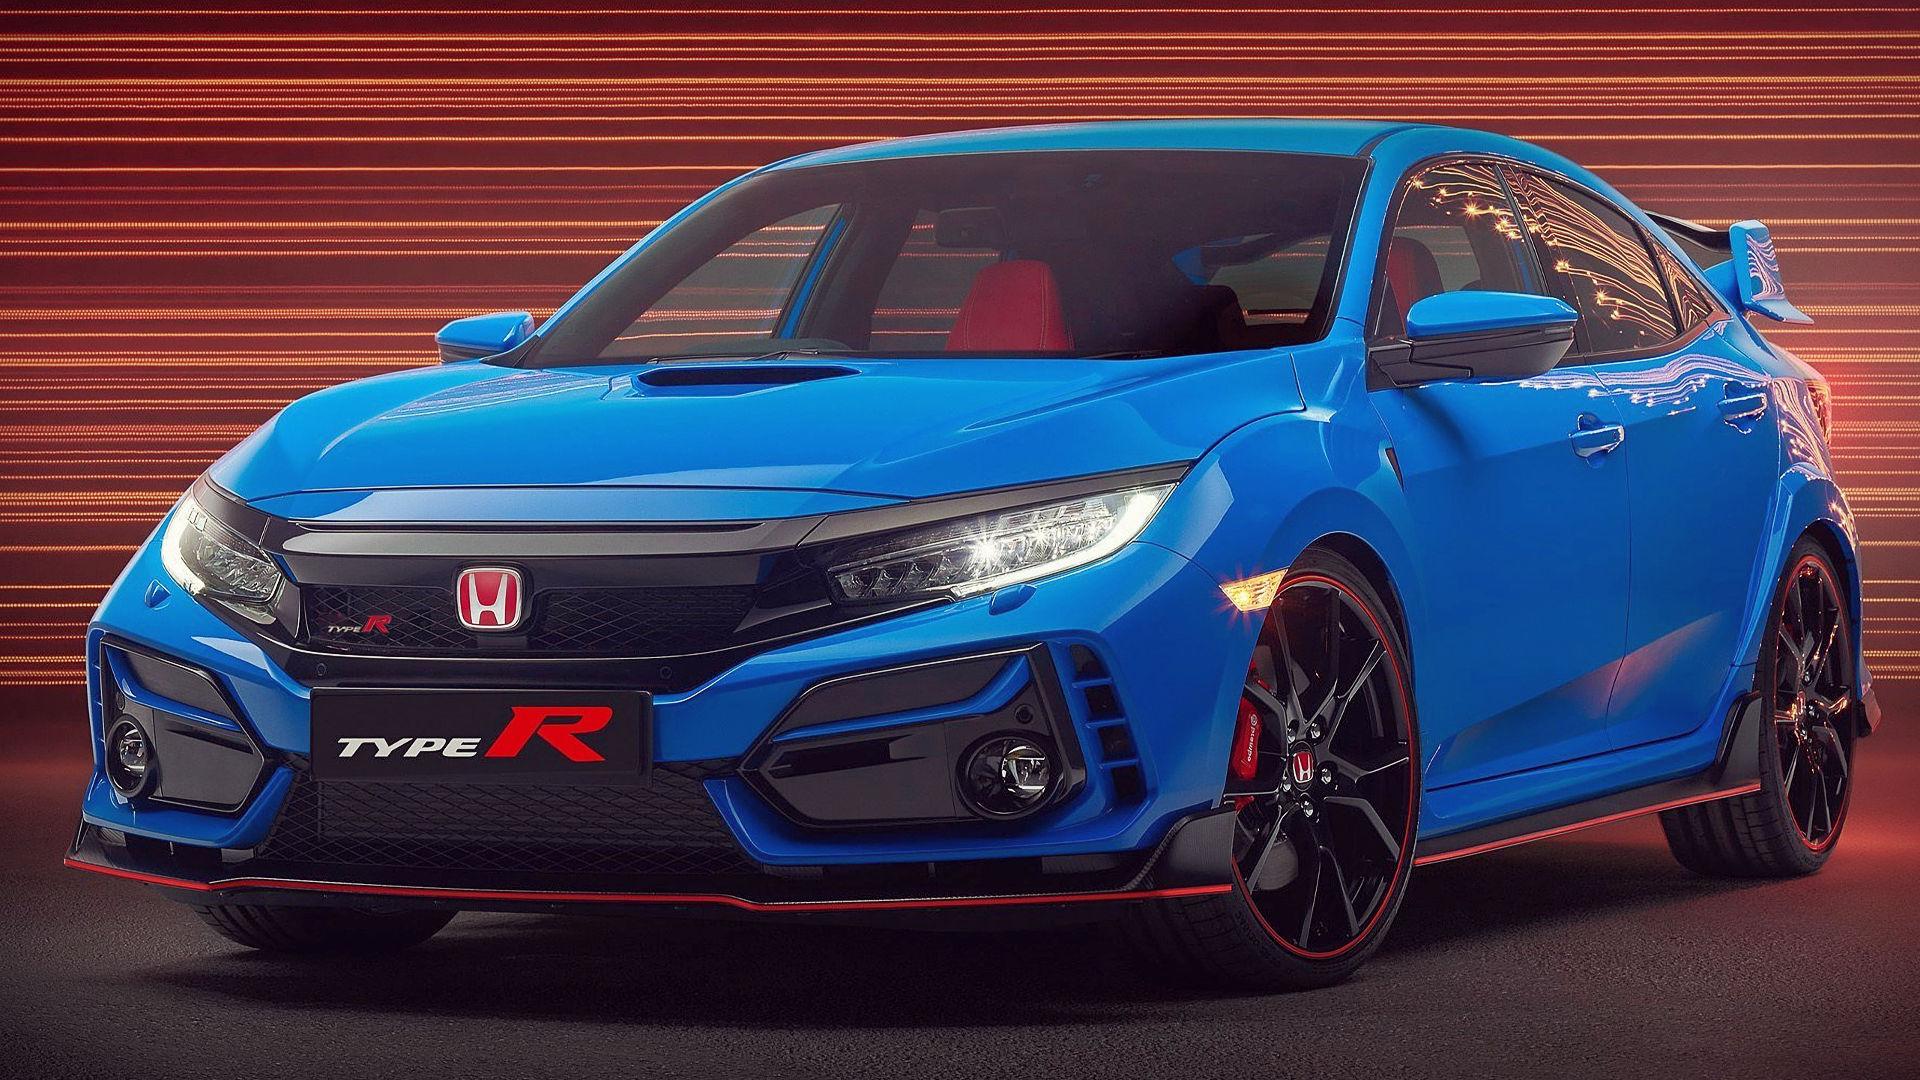 Honda Civic Type R 2020 Images